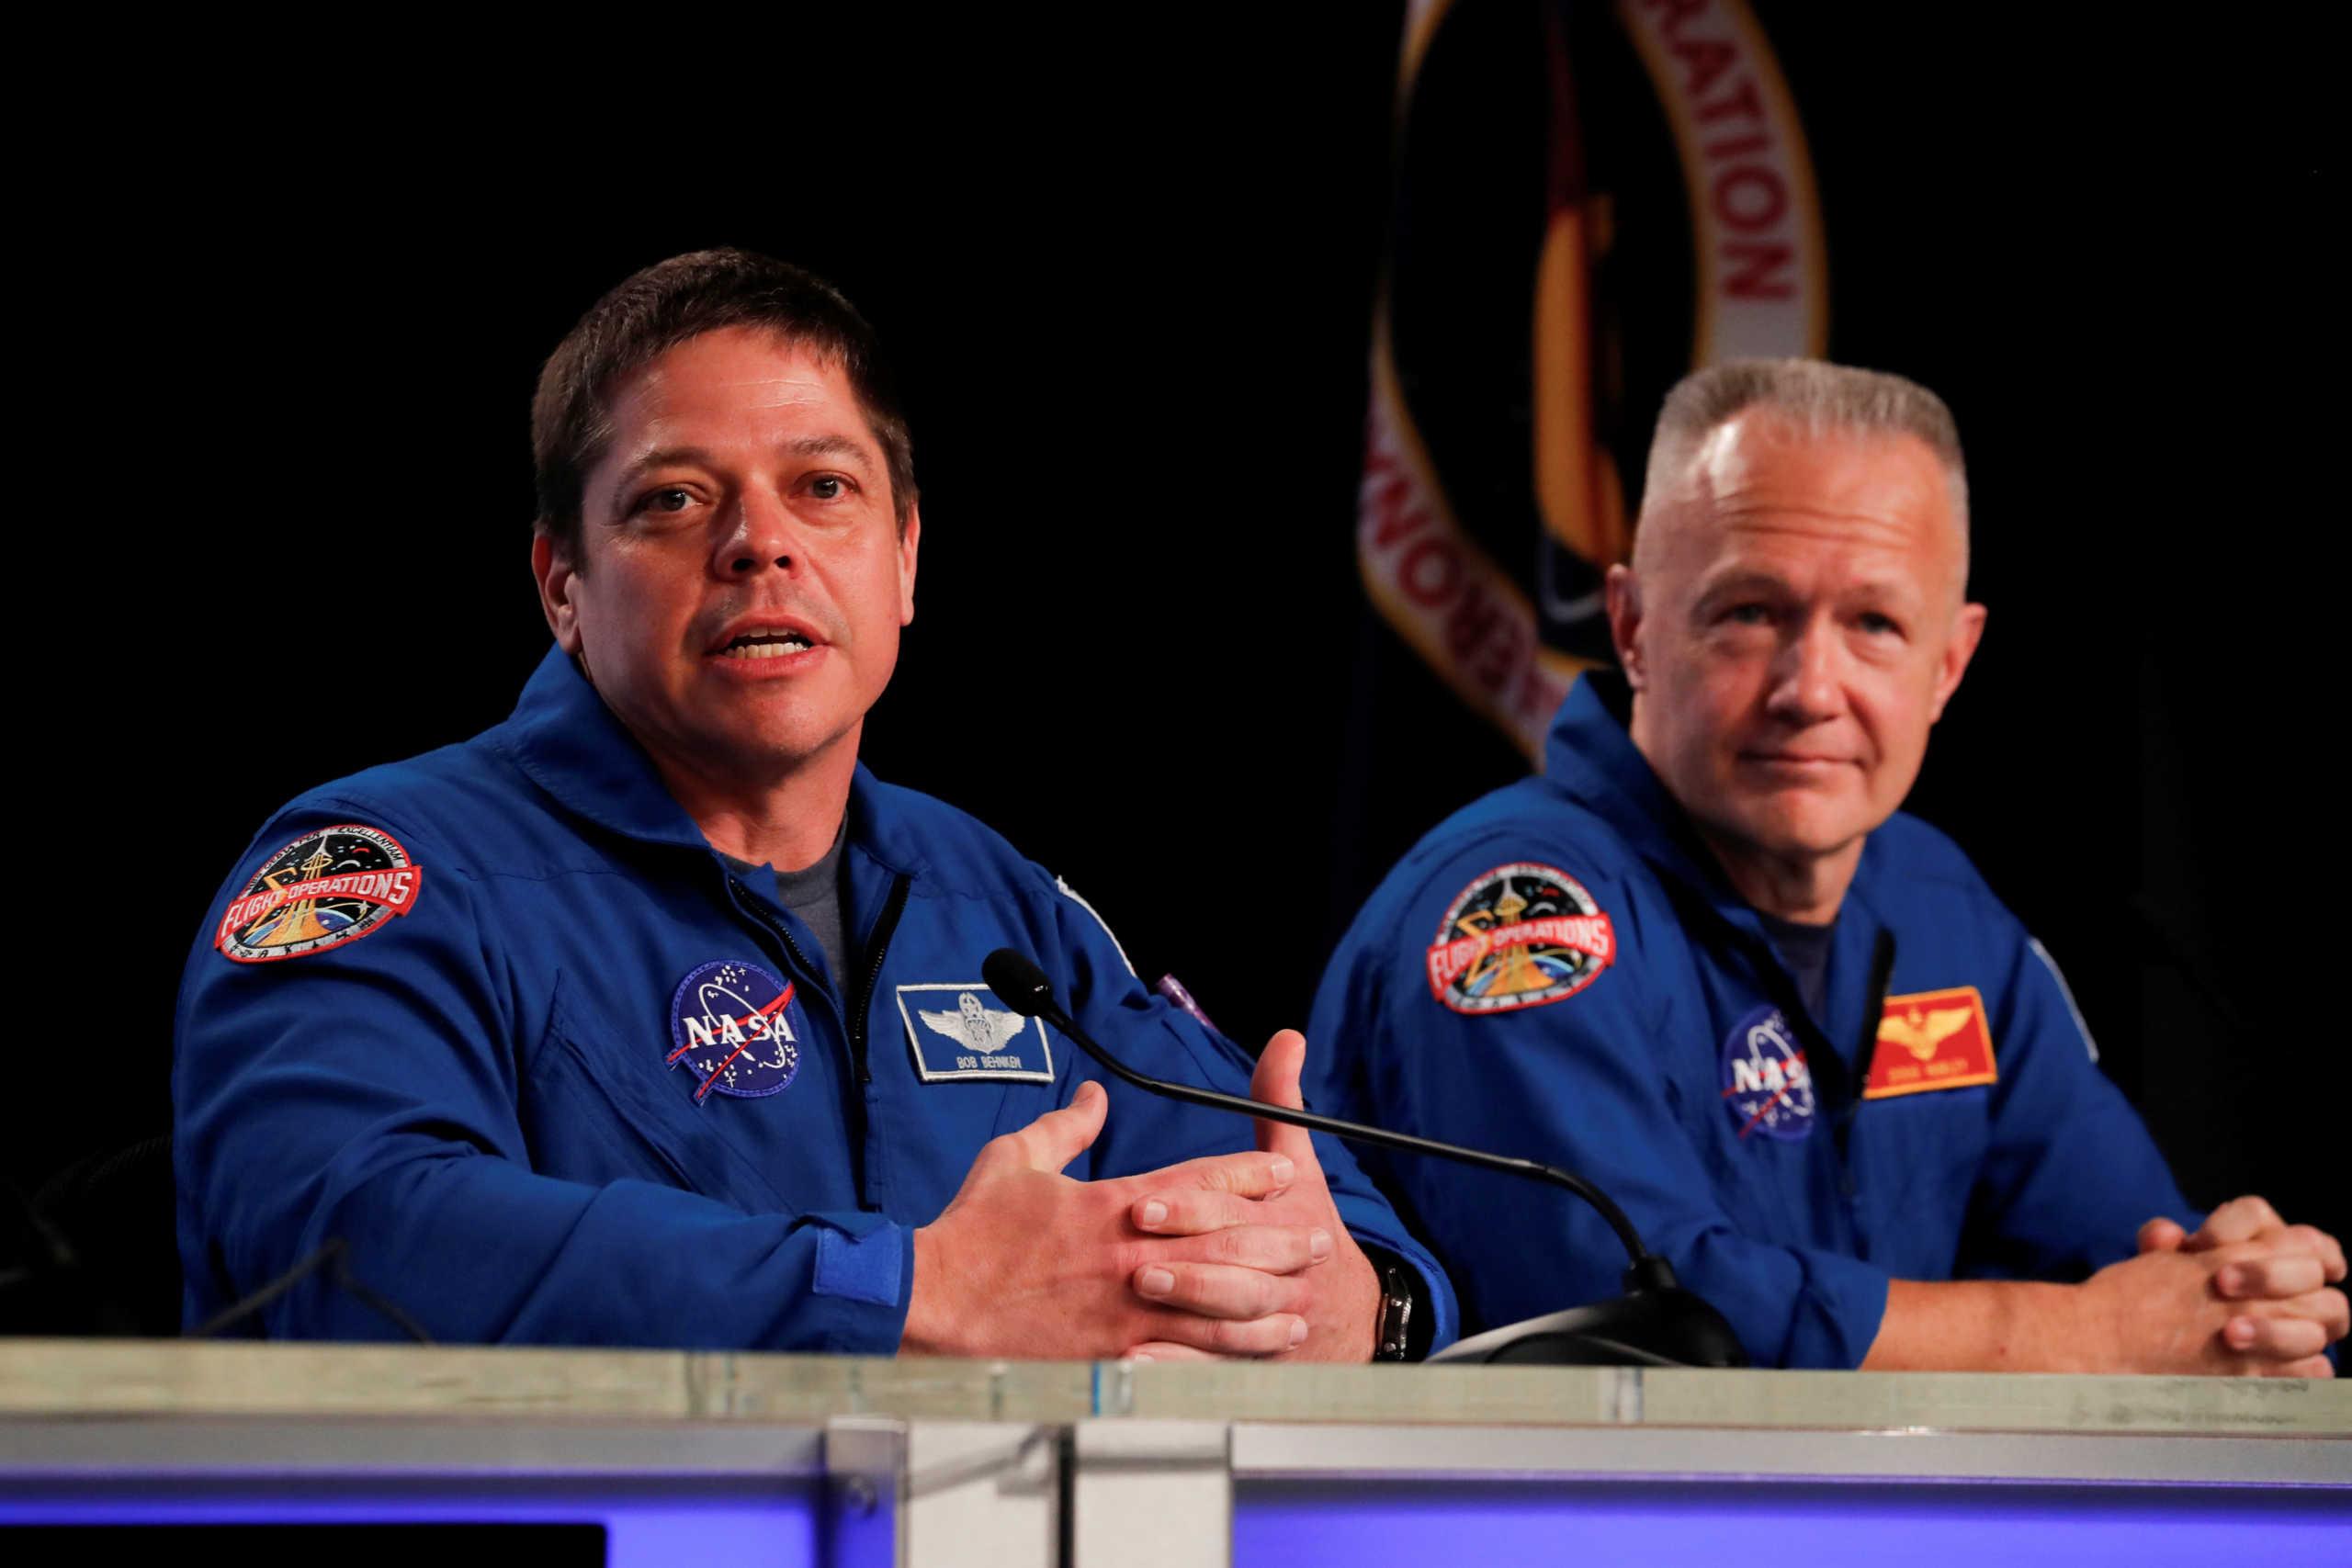 NASA: Από τα υπερηχητικά τζετ στο διάστημα – Ποια τα μέλη της ιστορικής αποστολής SpaceX